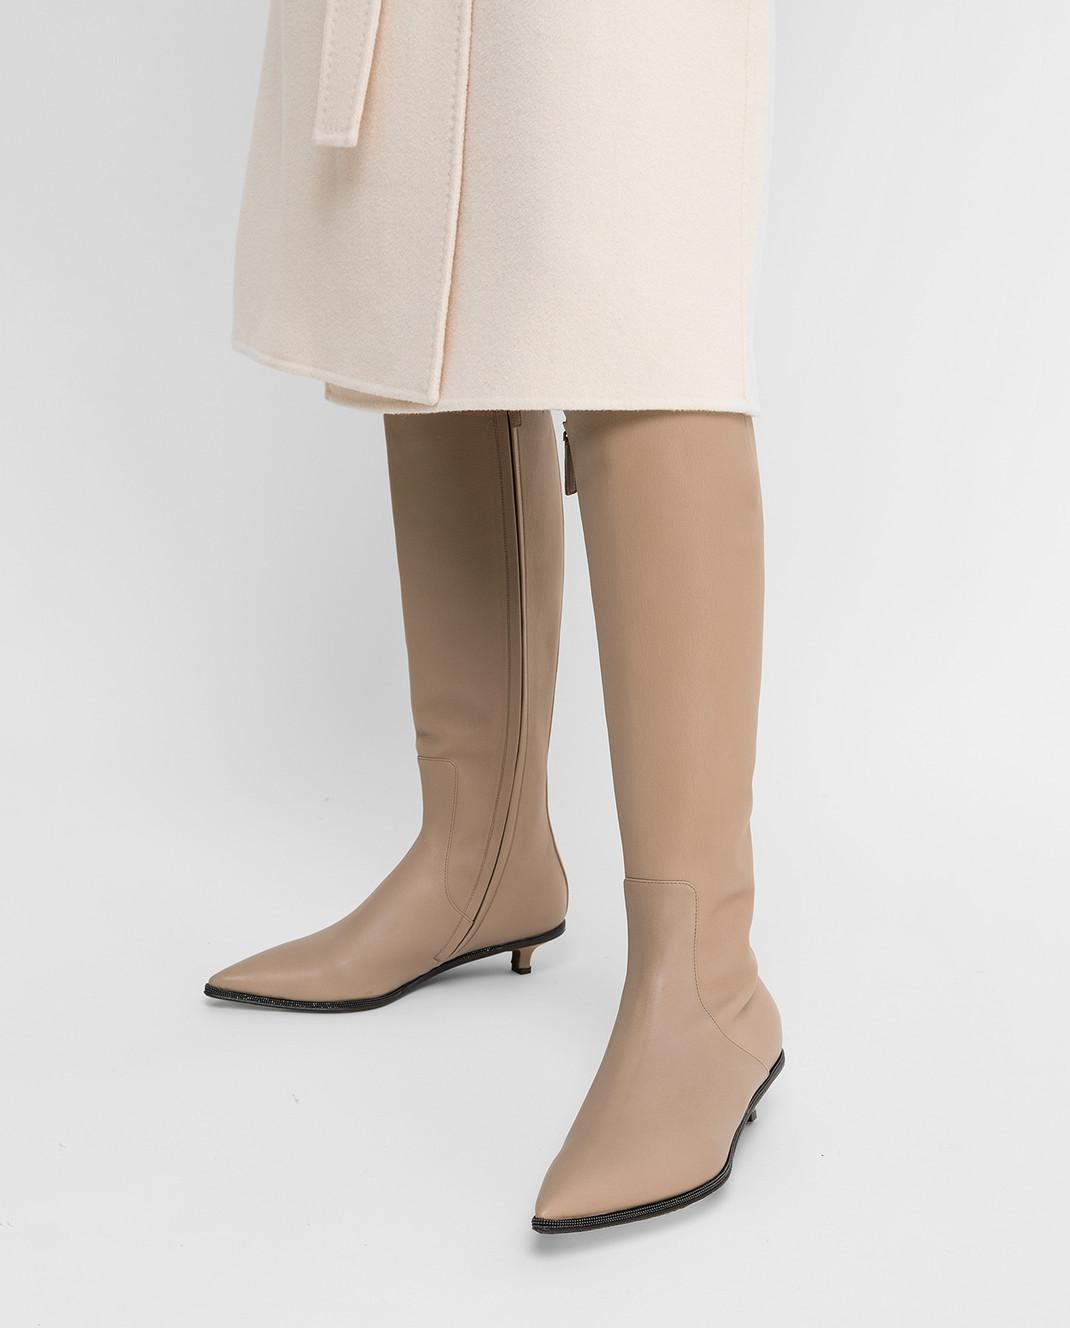 Brunello Cucinelli Бежевые кожаные сапоги изображение 2